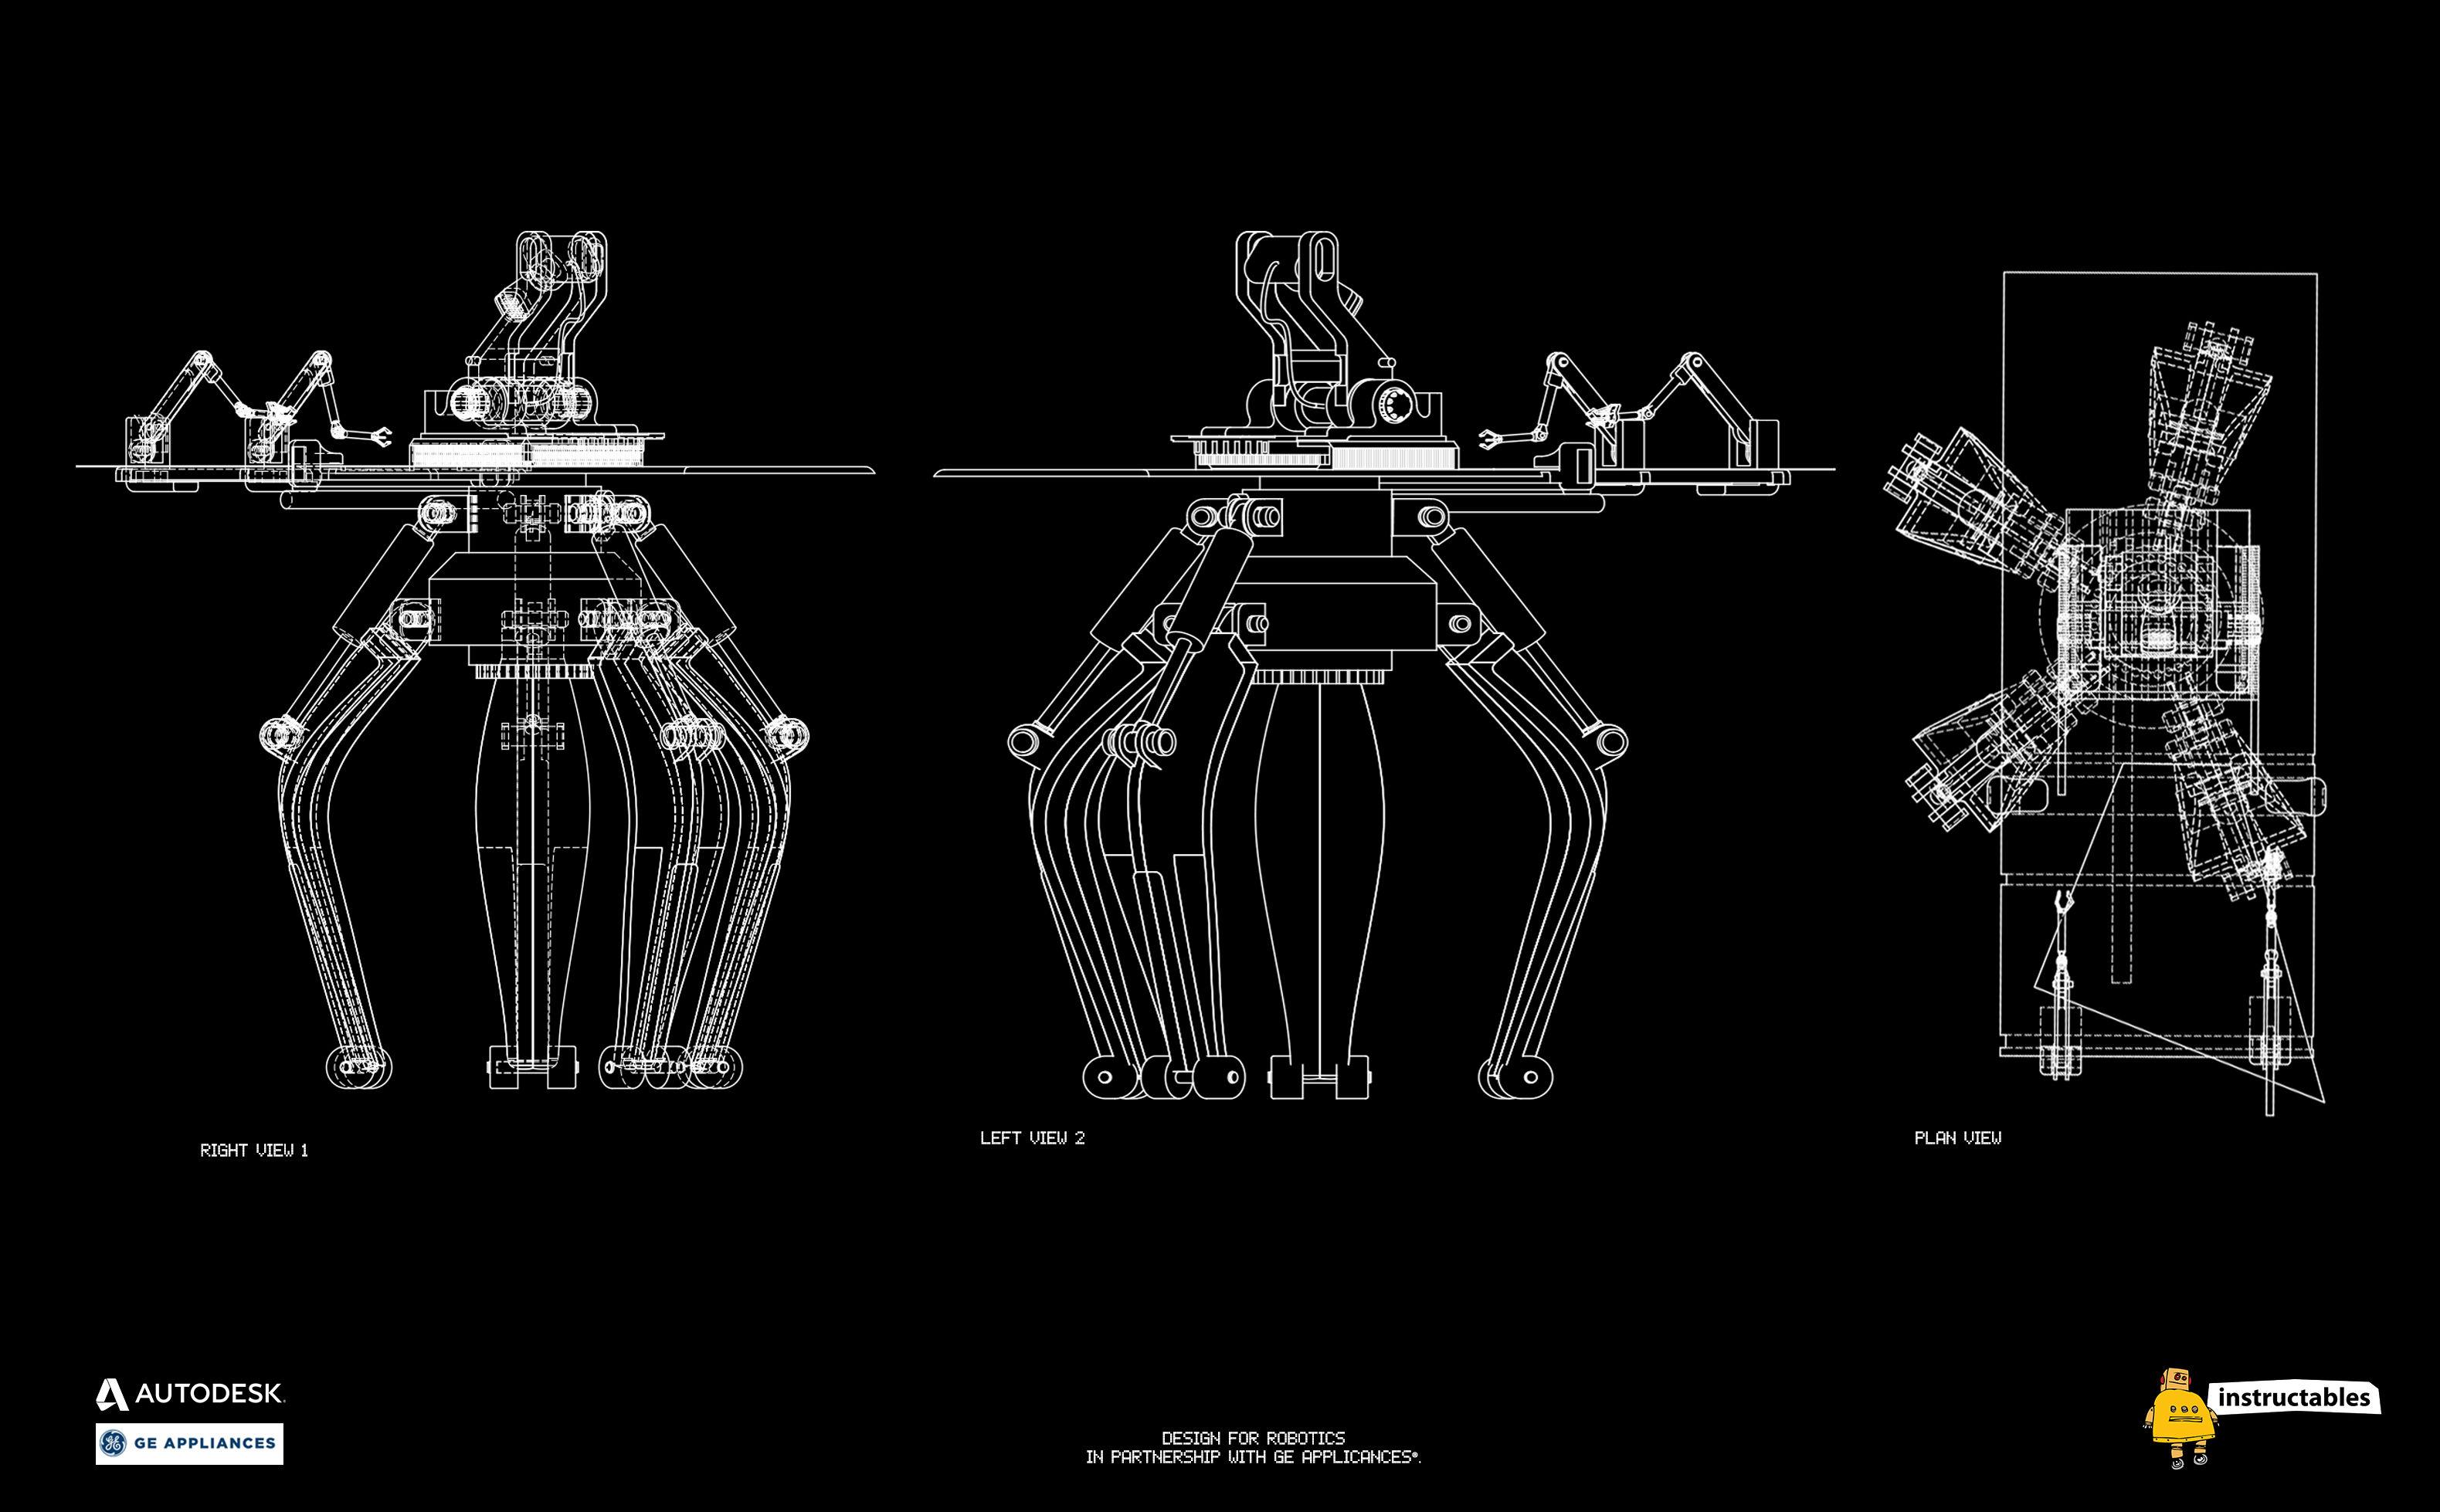 Robotic-page3-b-3500-3500